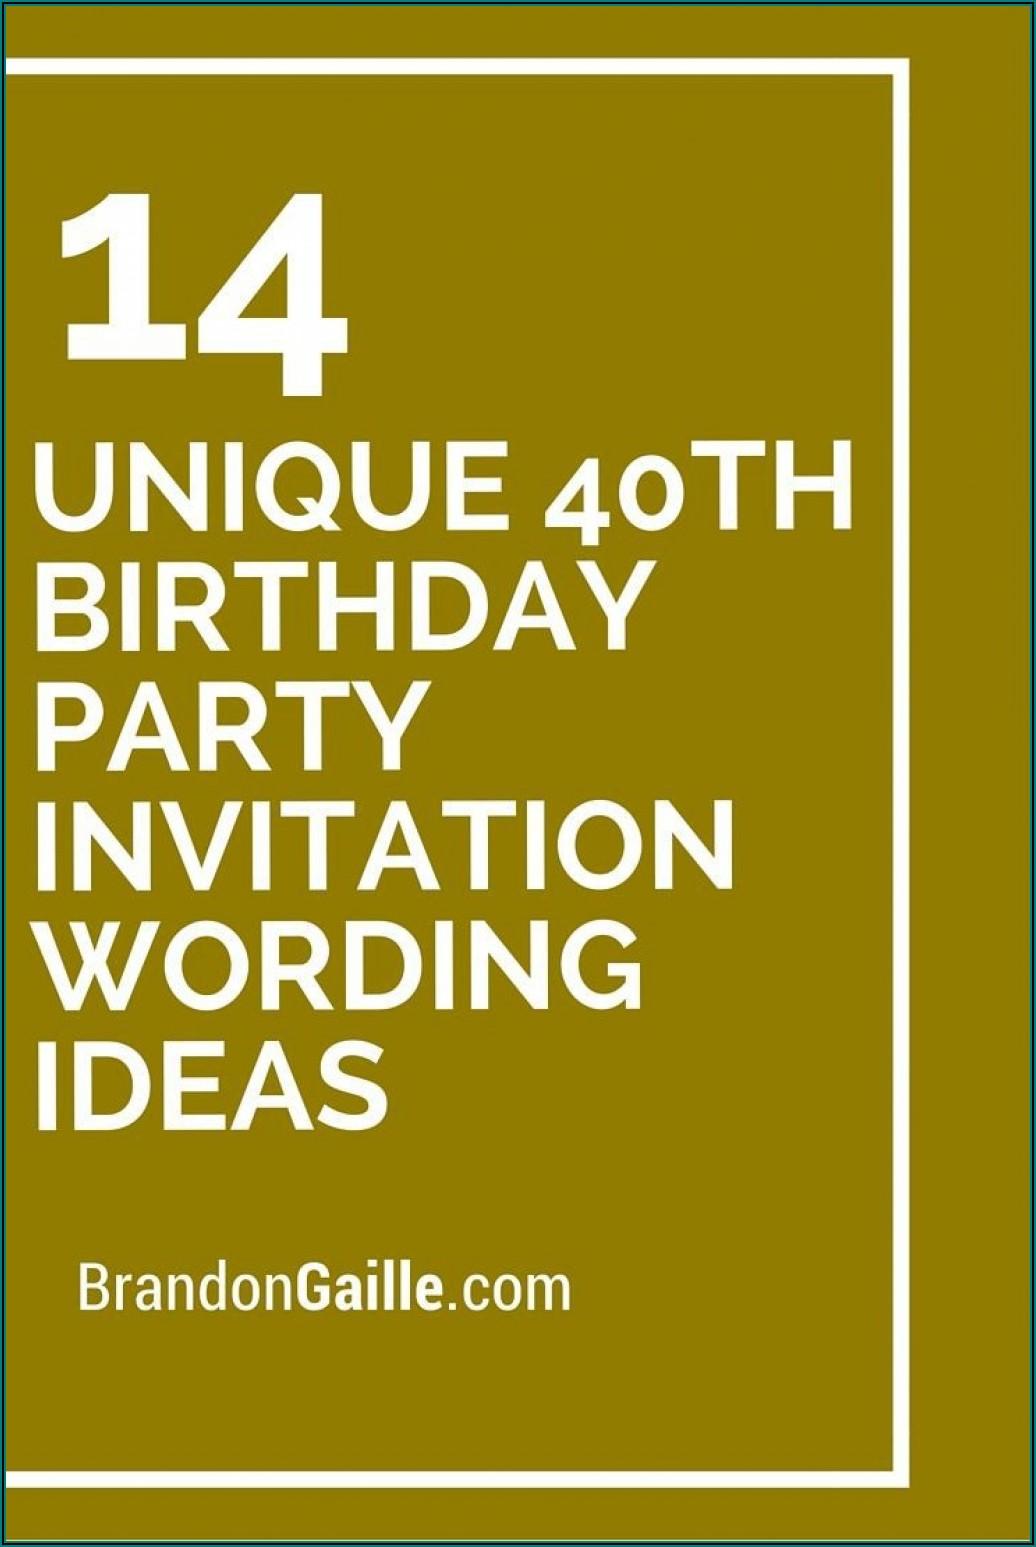 40th Birthday Party Invitation Wording Samples